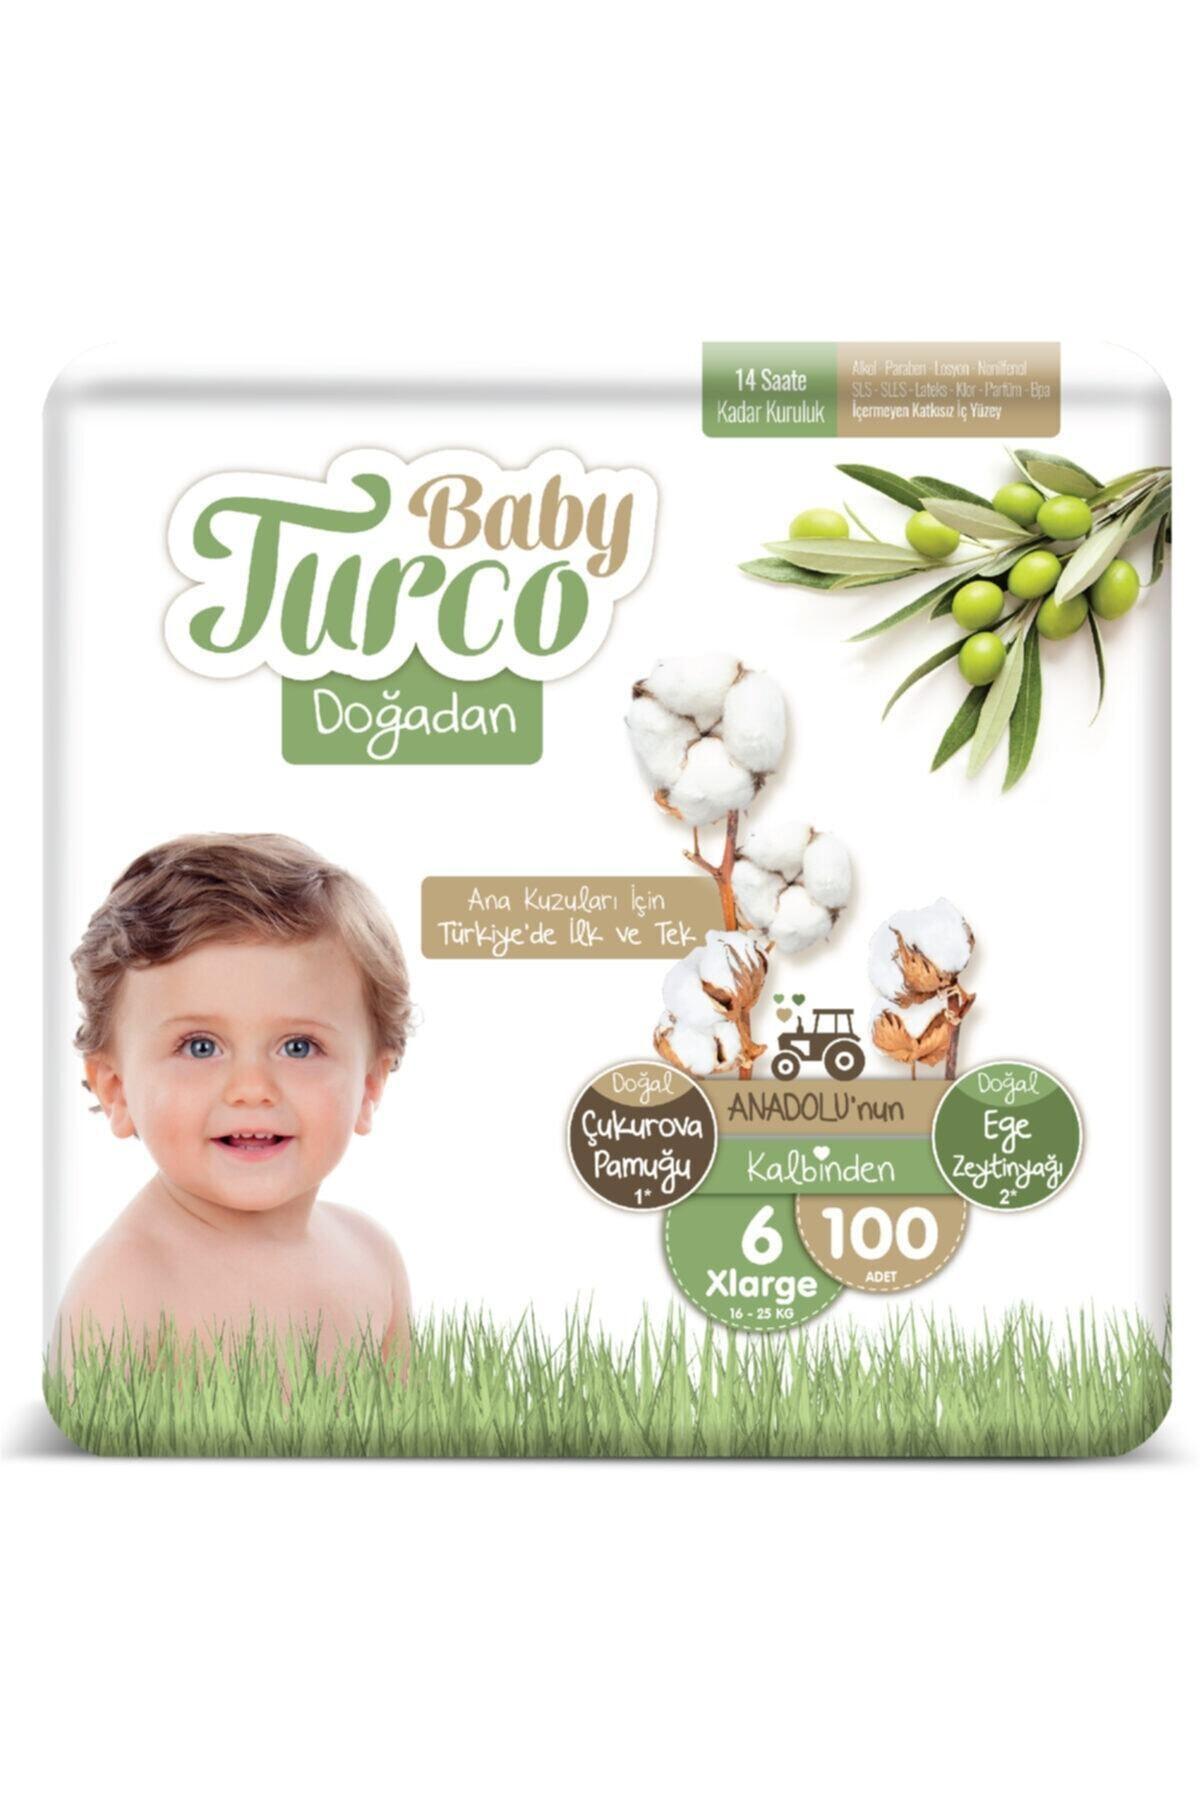 Baby Turco Doğadan 6 Numara Xlarge 100 Adet 1